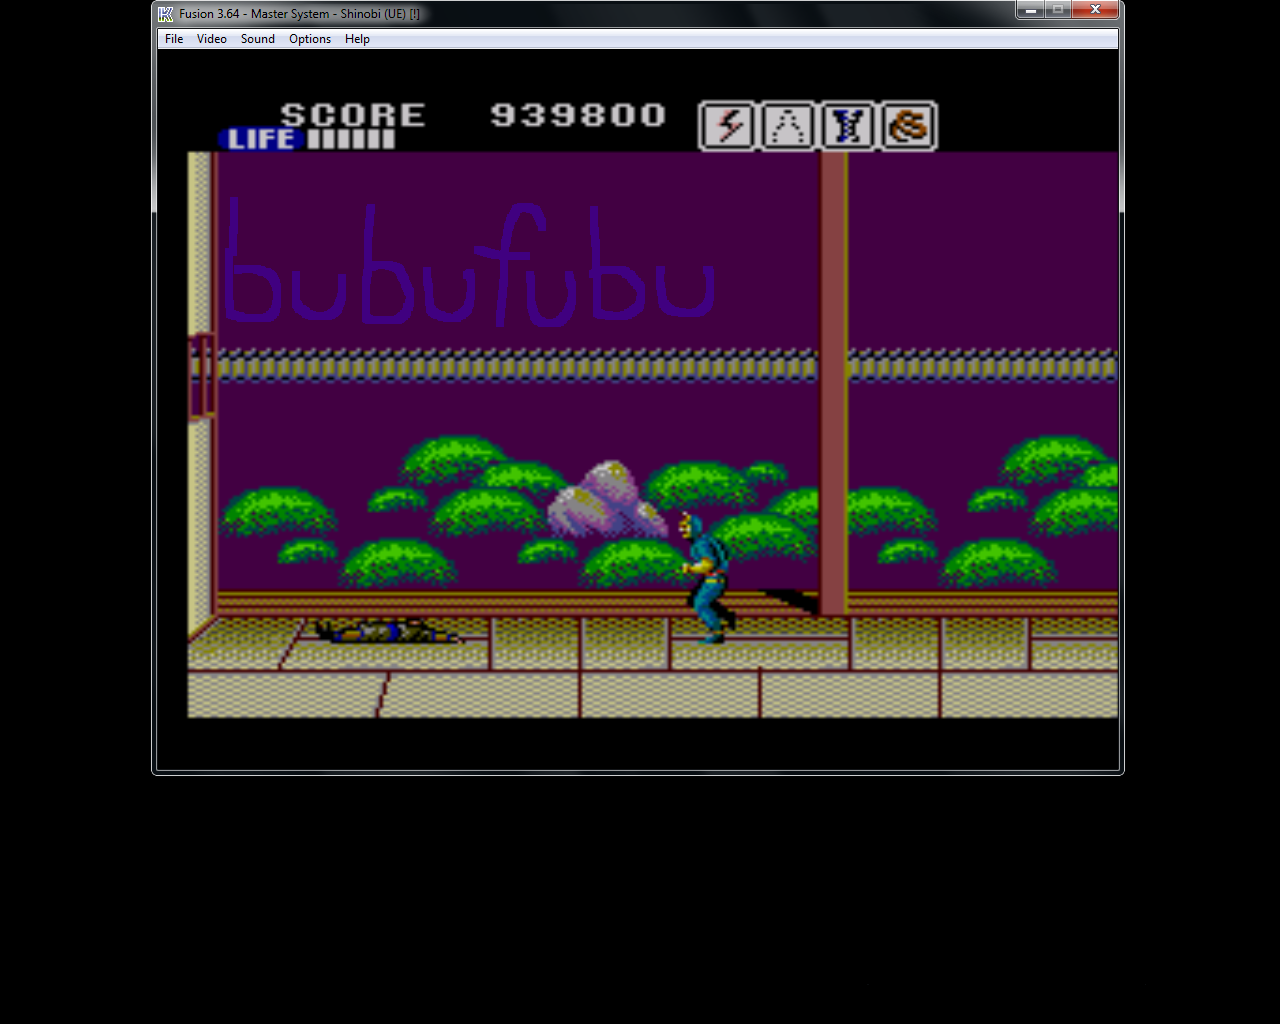 bubufubu: Shinobi (Sega Master System Emulated) 939,800 points on 2015-06-10 14:21:24